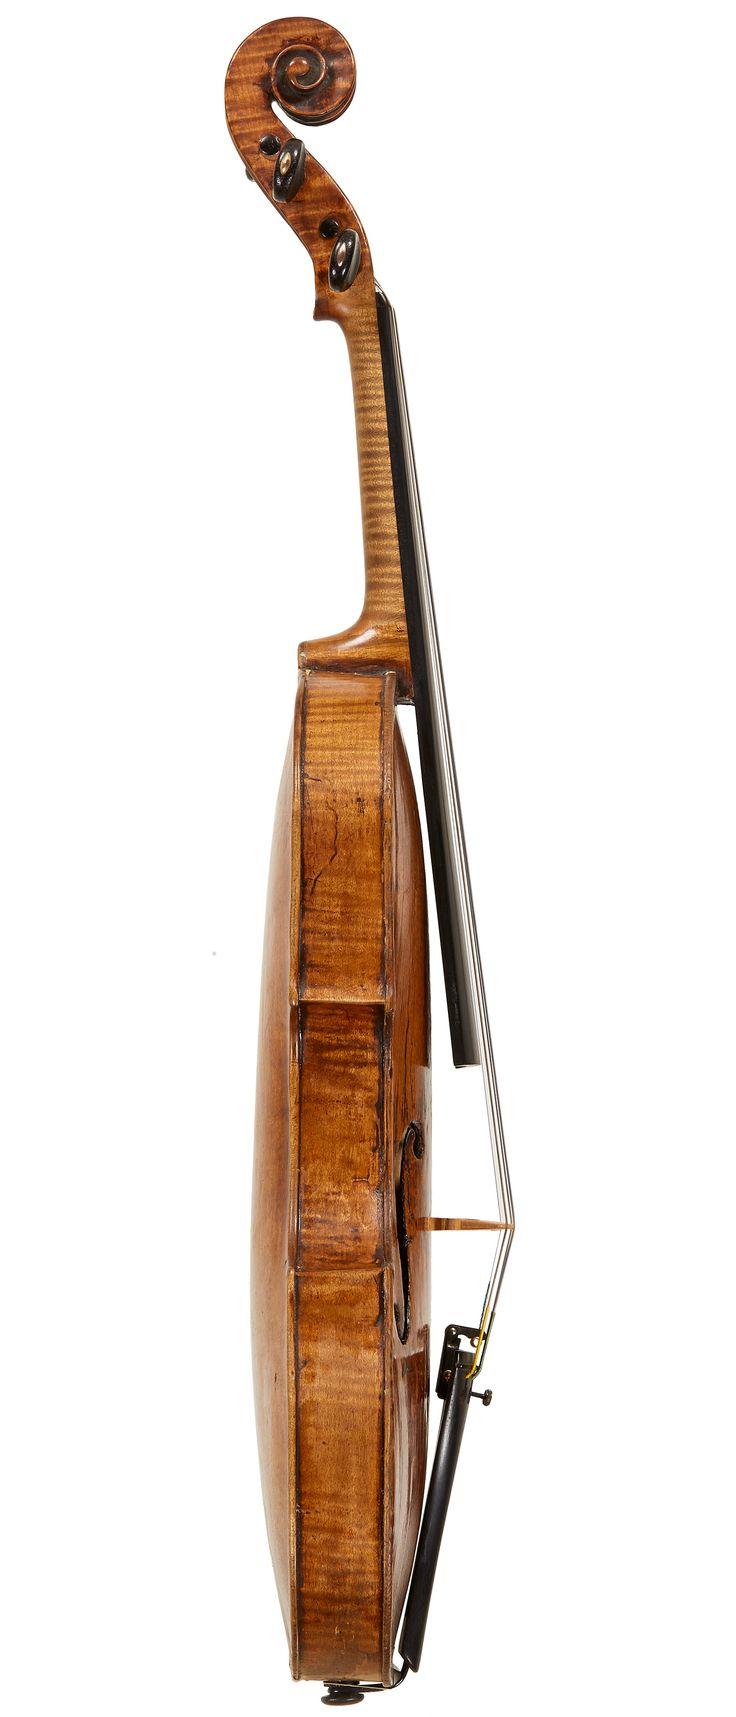 25 best ideas about amati violin on pinterest violin - Volpino piccolo ...